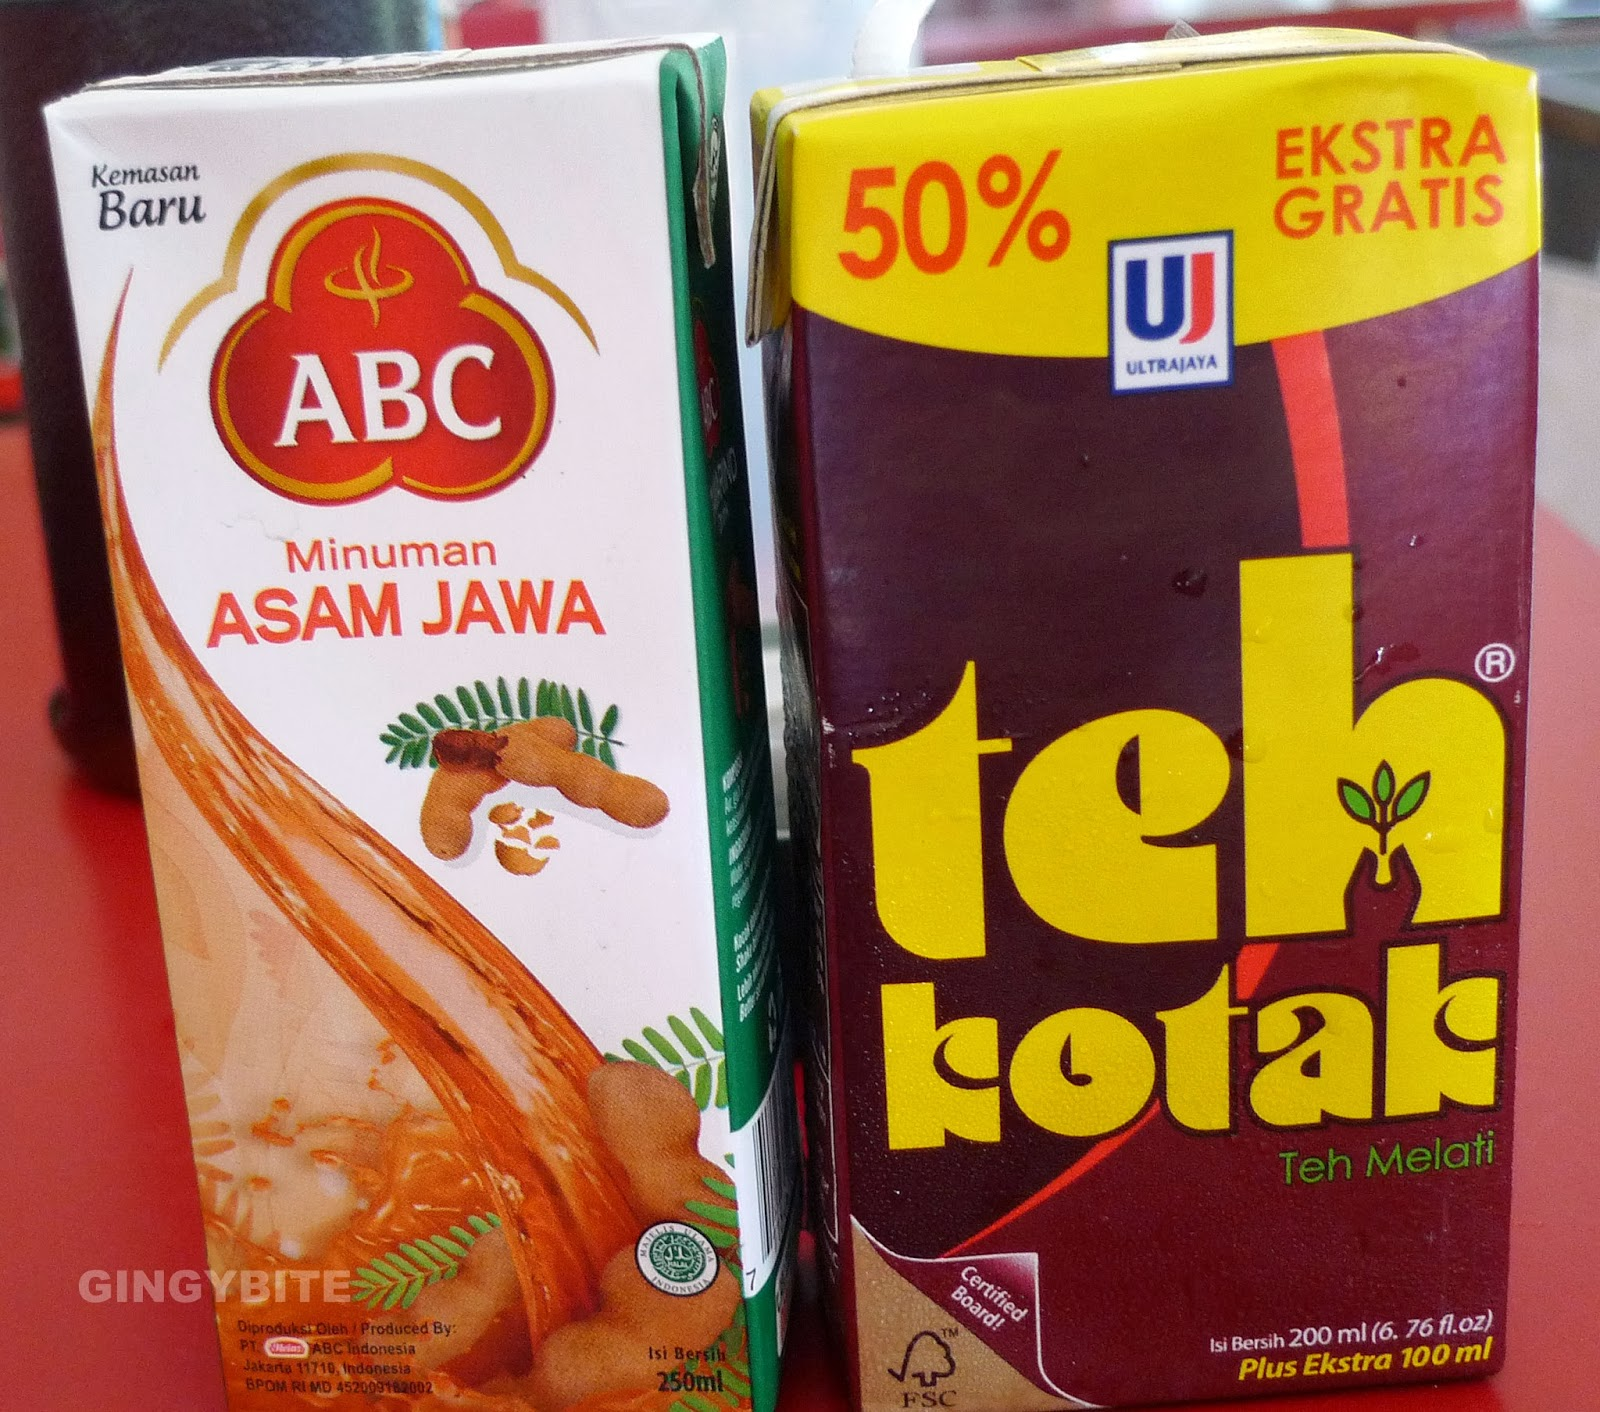 Asam Jawa Drink and Teh Kotak